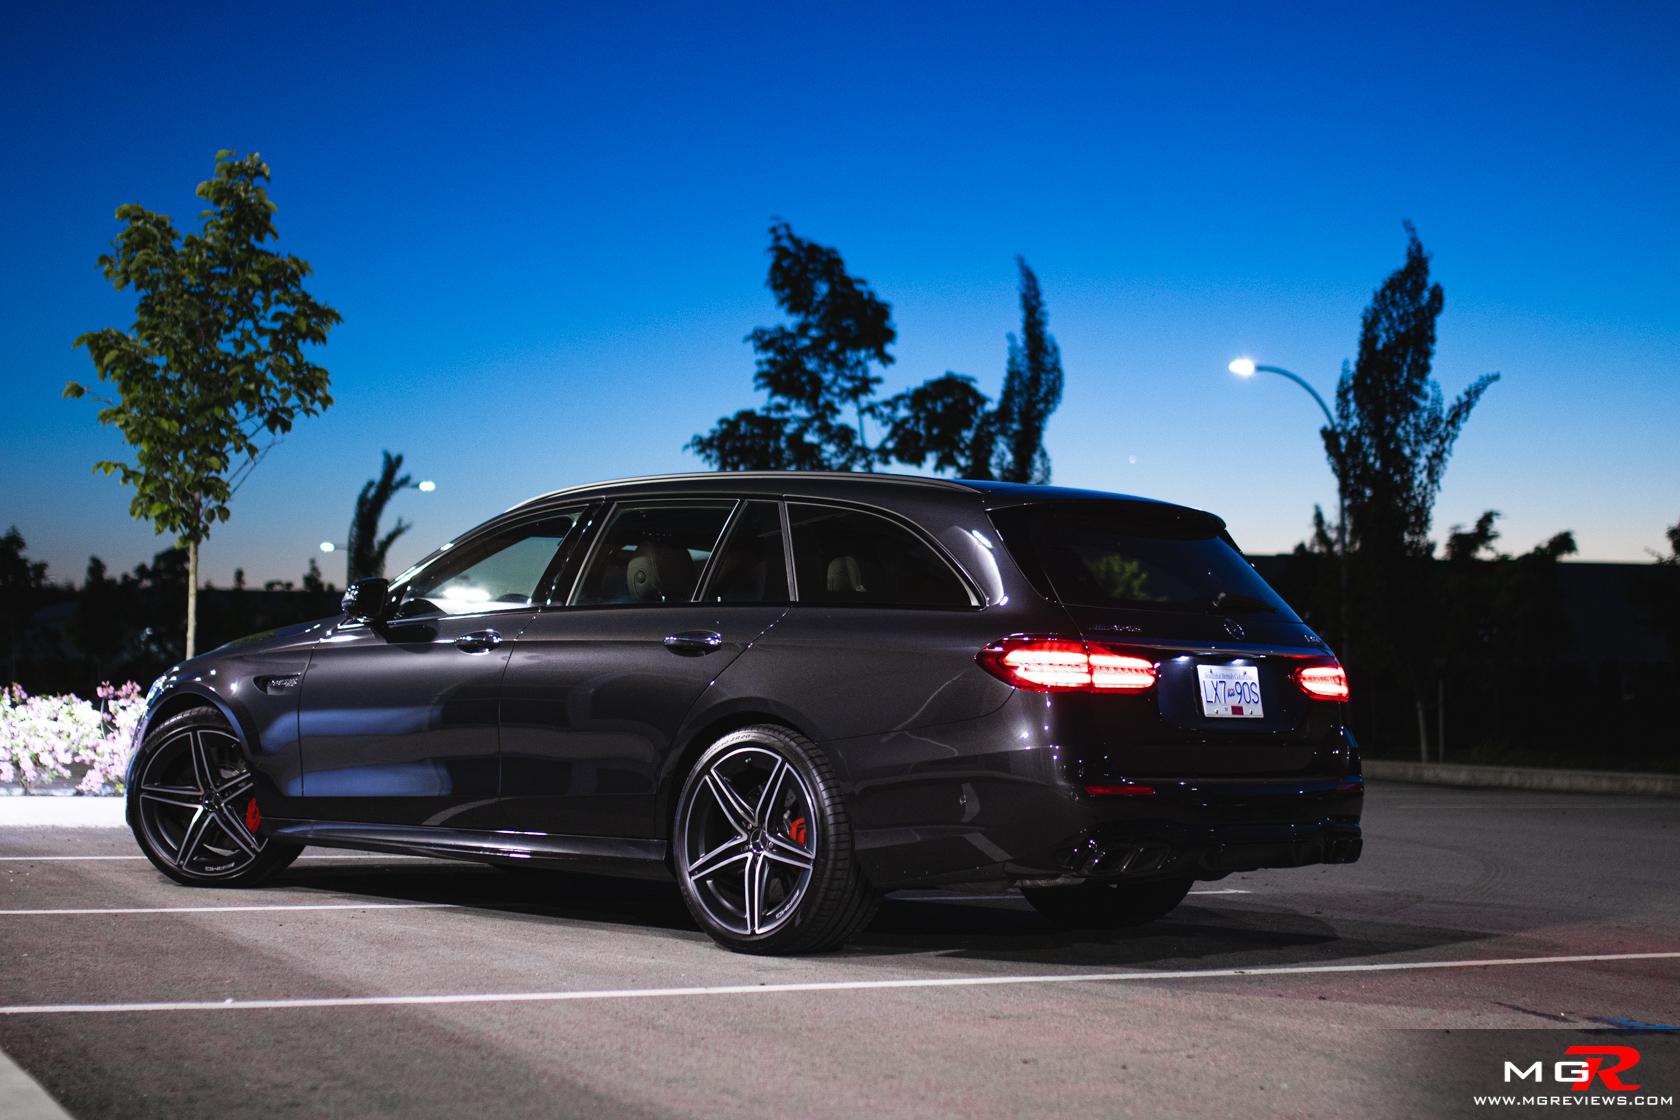 2021 Mercedes-Benz E63 AMG Wagon 4MATIC+